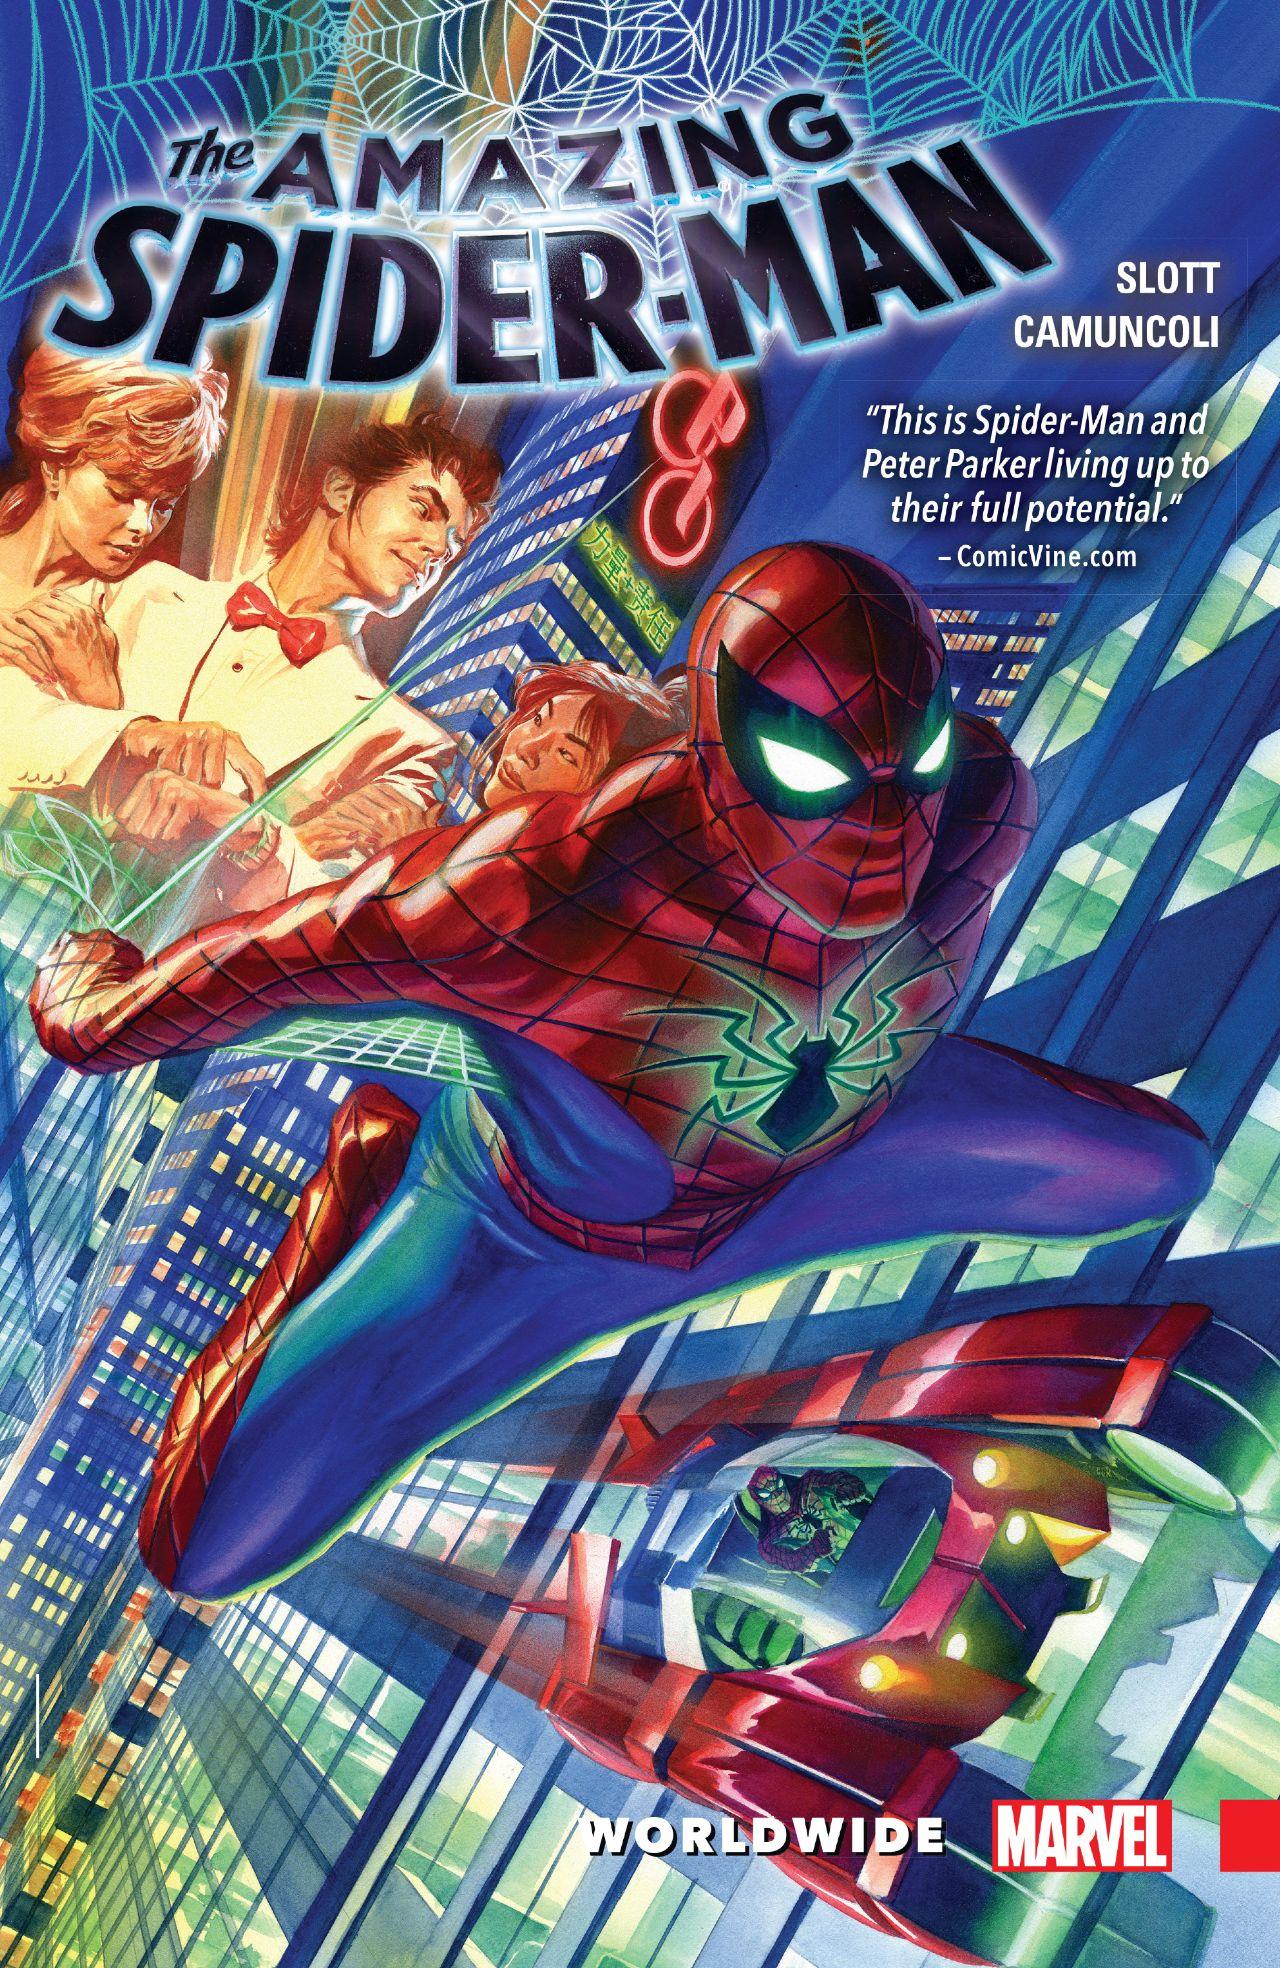 Amazing Spider-Man: Worldwide TPB Vol 1